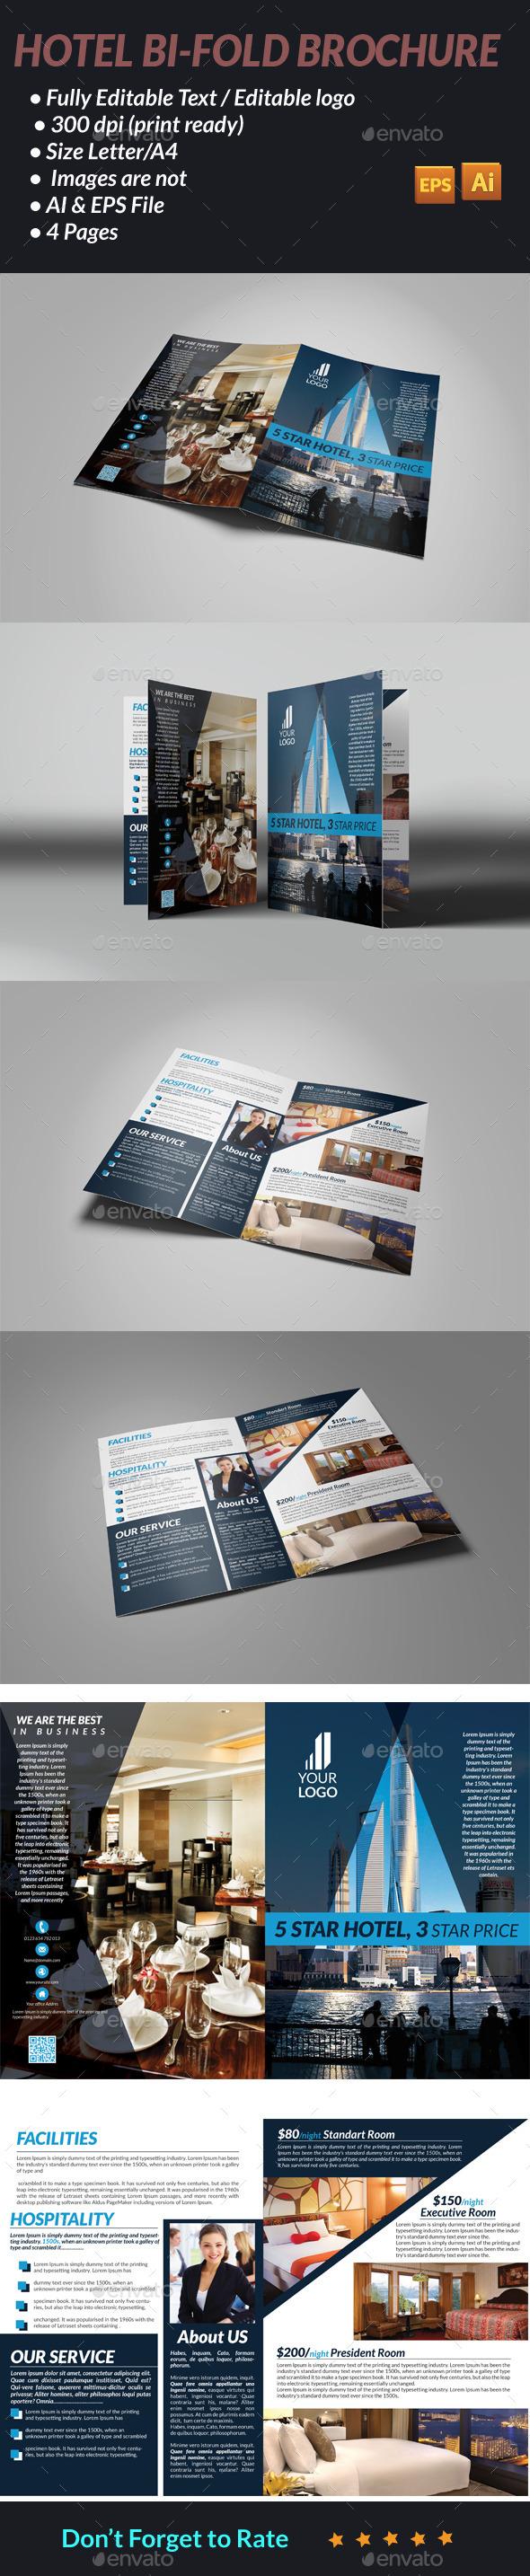 GraphicRiver Hotel Bi-Fold Brochure 11947710